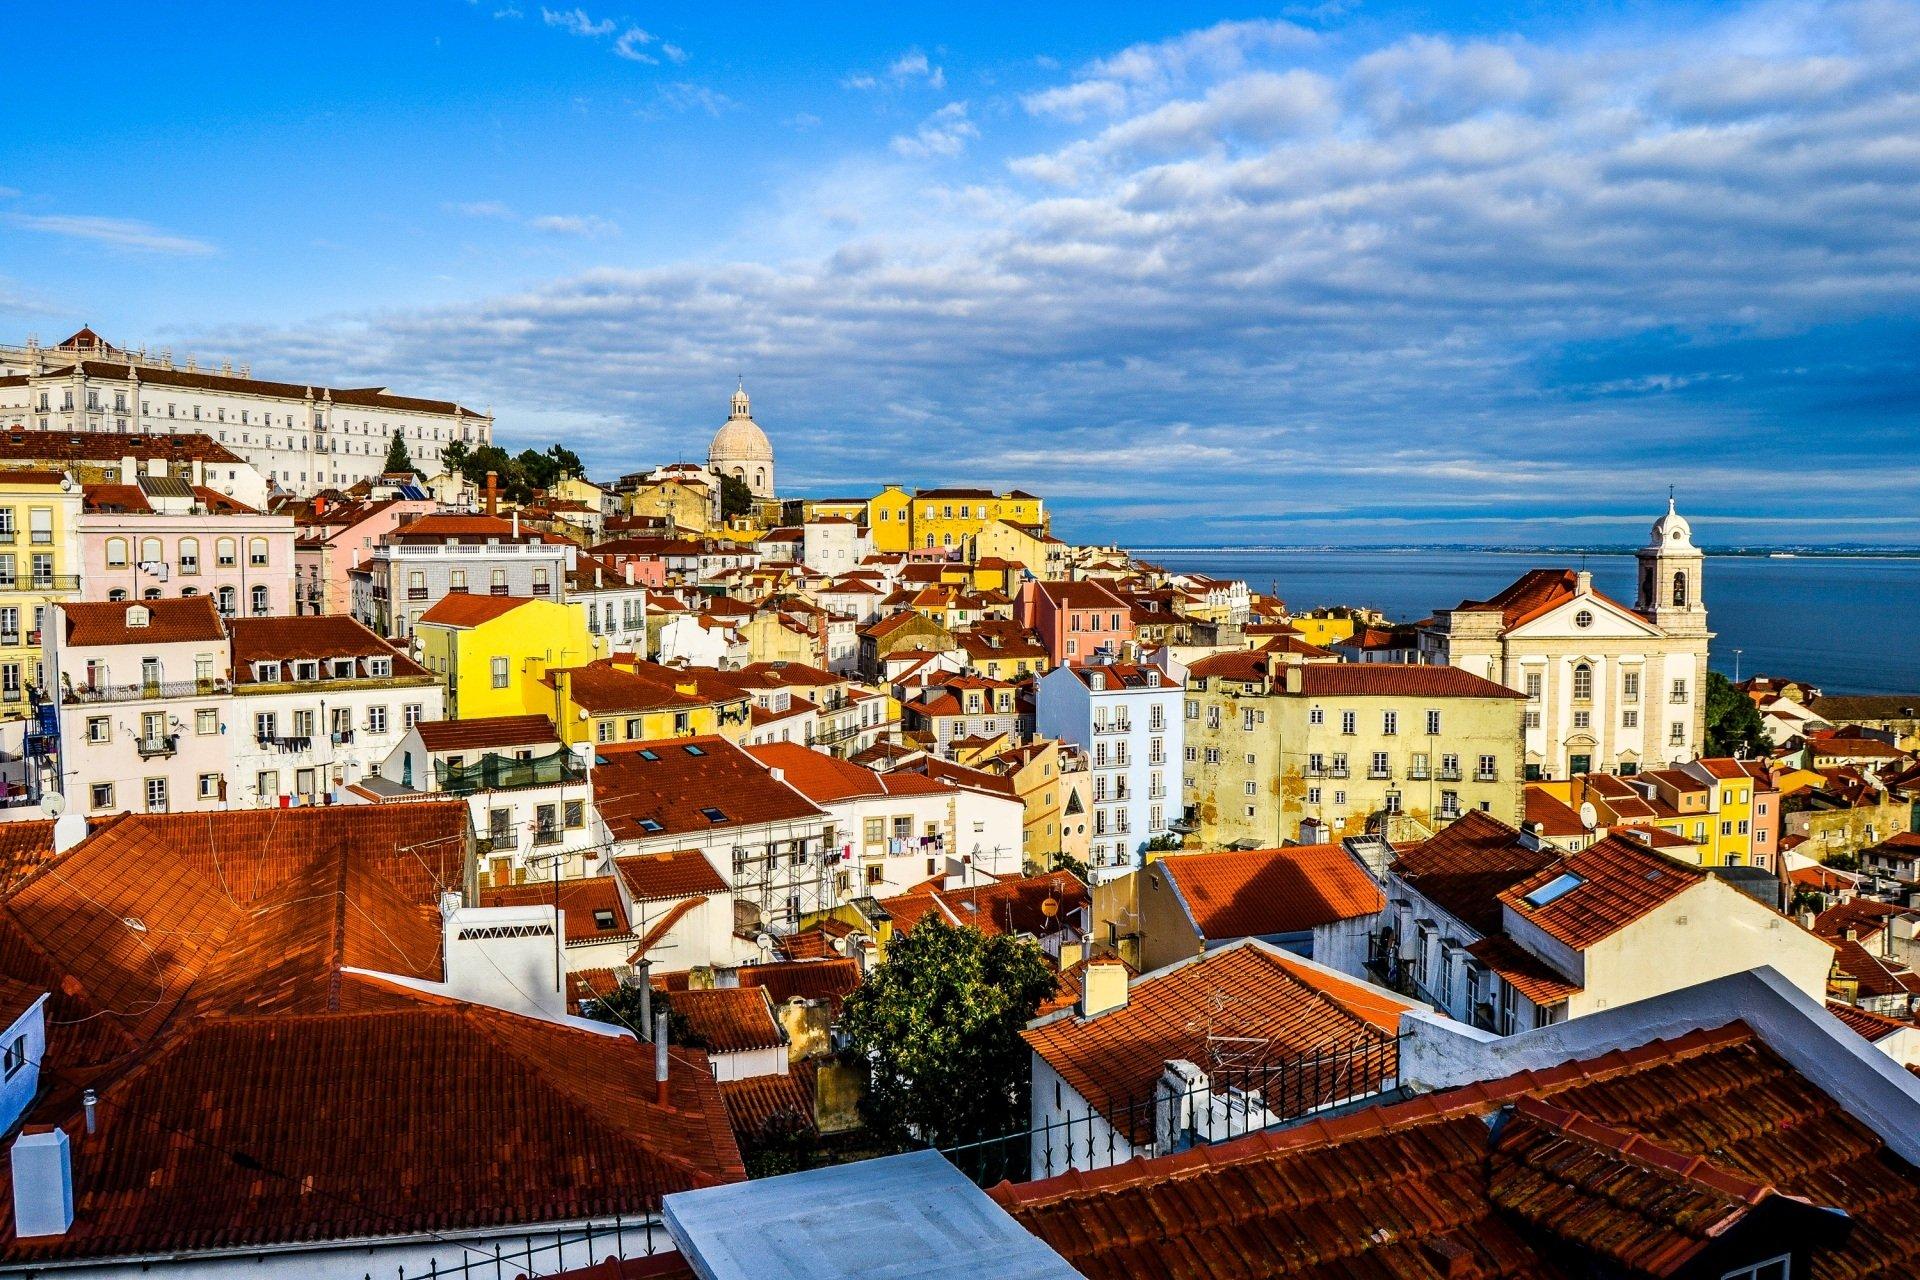 Lisbon Wallpaper Hd Lisbon Portugal Cityscape Full Hd Wallpaper And